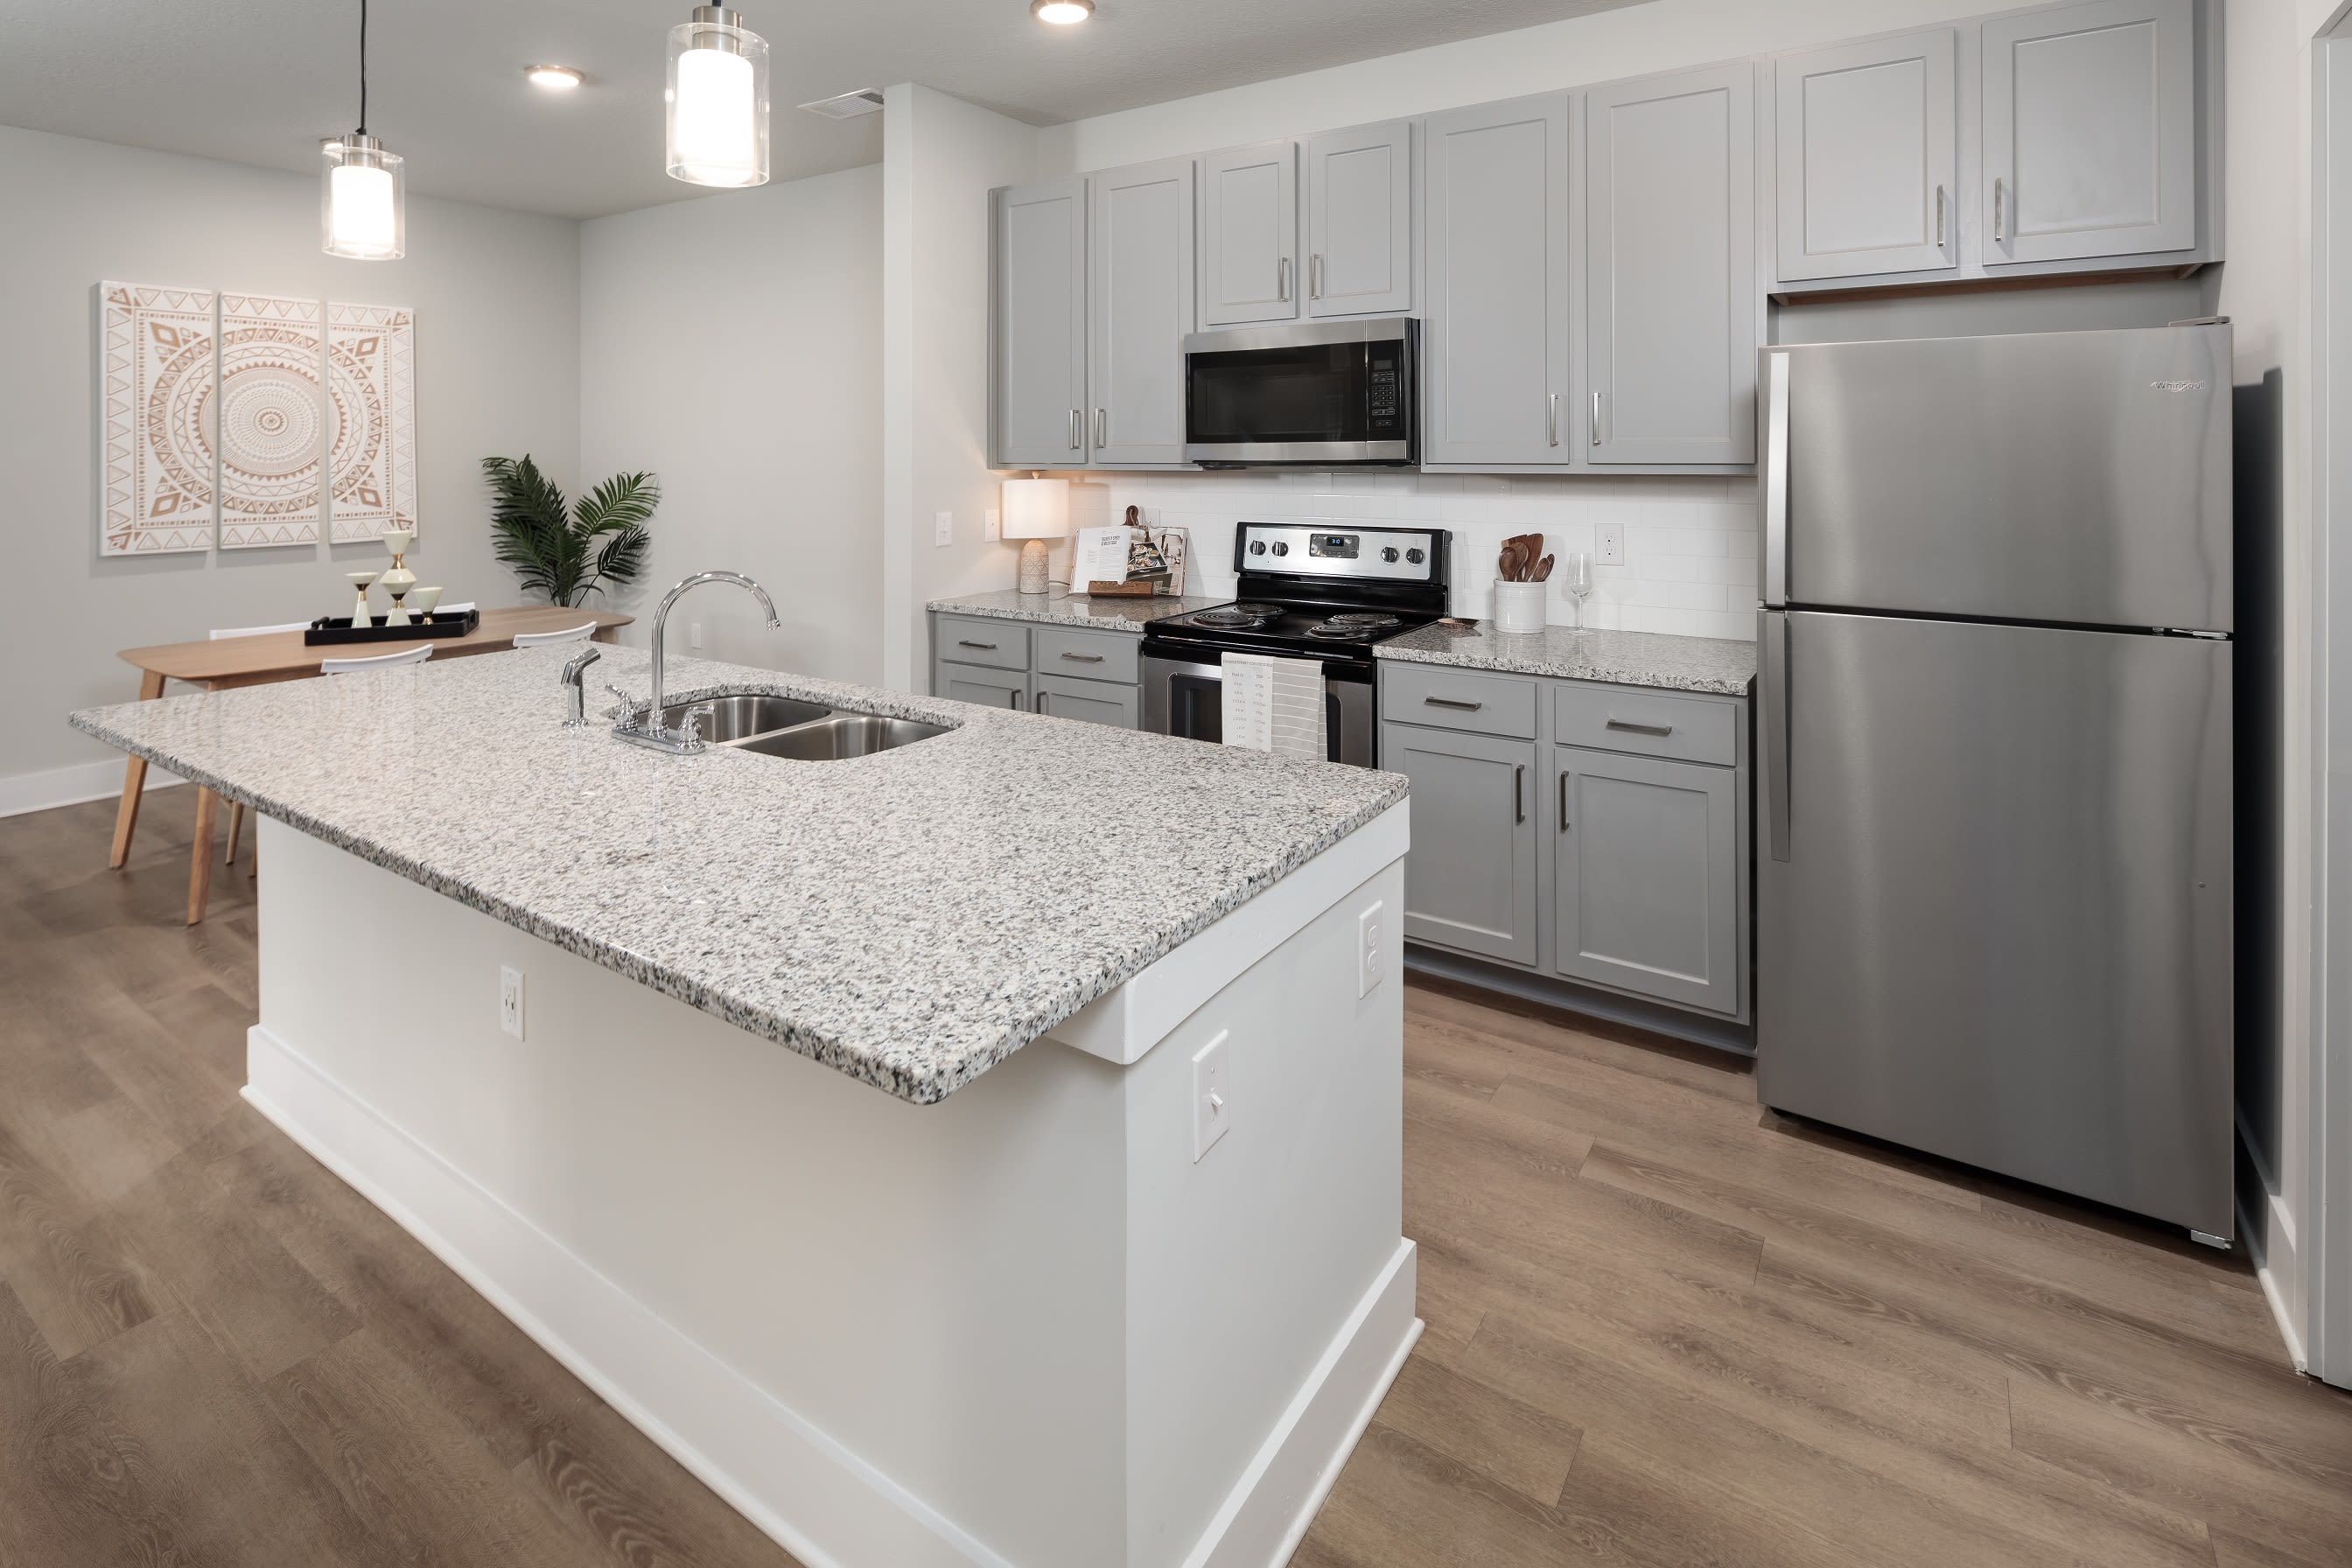 Modern kitchen dining area at The Mason in Ladson, South Carolina